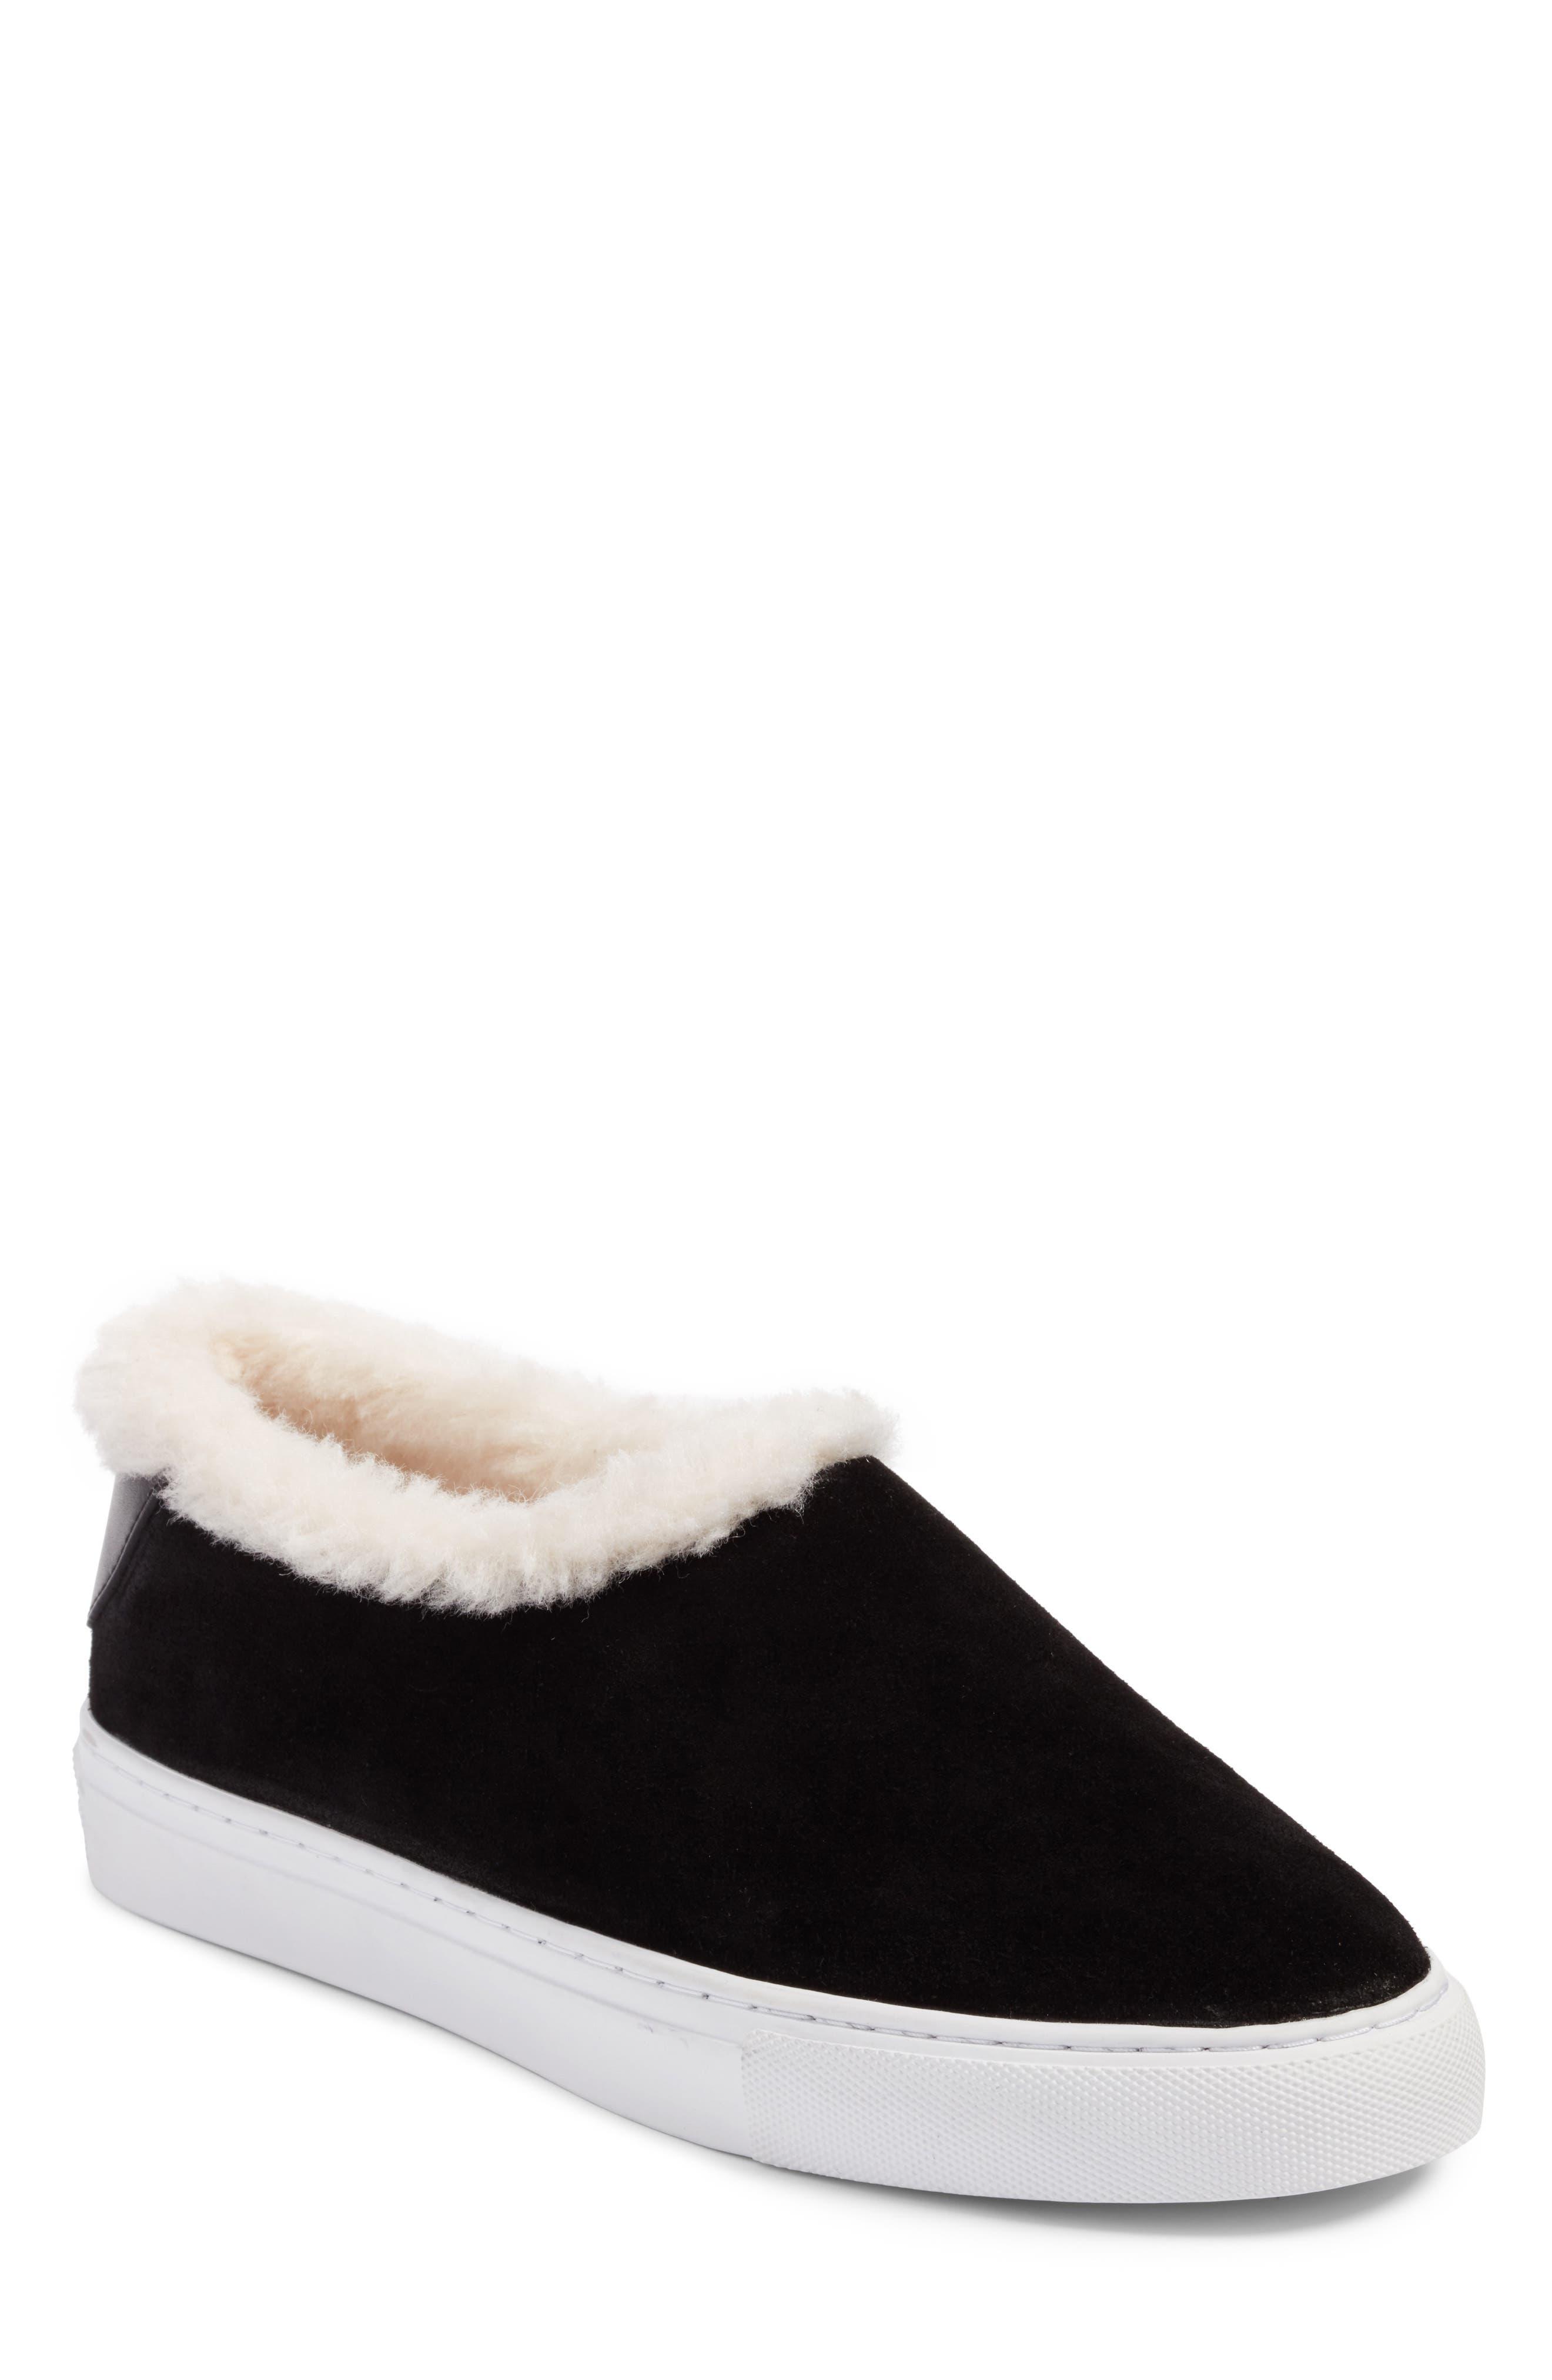 Tory Burch Miller Suede & Genuine Shearling Sneaker (Women)